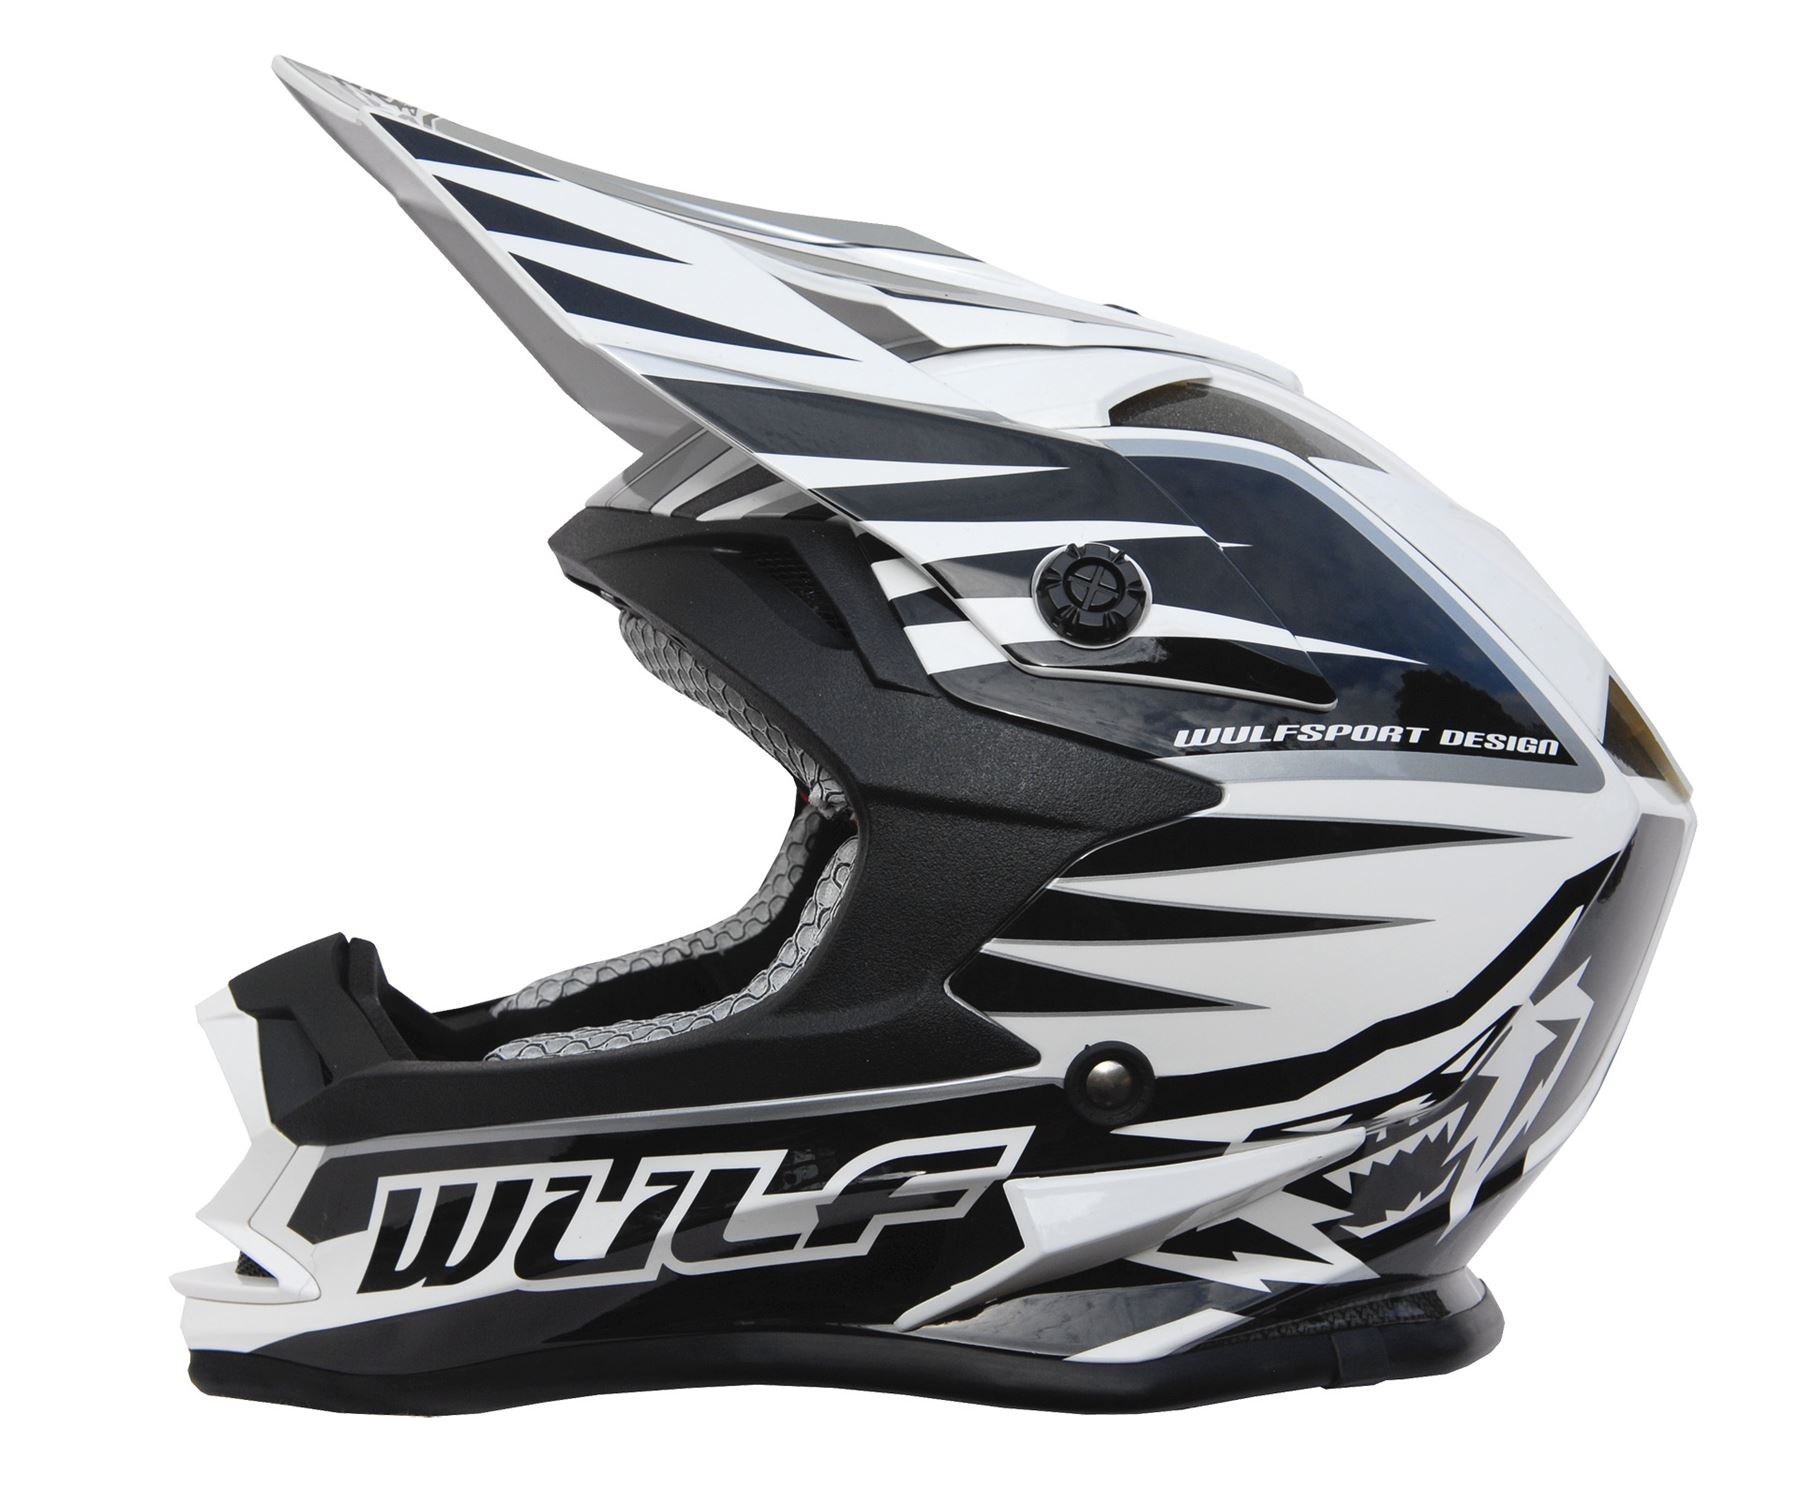 Wulfsport Cub Kids Youth Advance ACU Gold Off Road  : b31c54d7 26b2 4bf4 b3d8 df5cc33a5673 <strong>Ultra</strong> Lightweight Motorcycle Helmets from www.ebay.co.uk size 1800 x 1488 jpeg 193kB